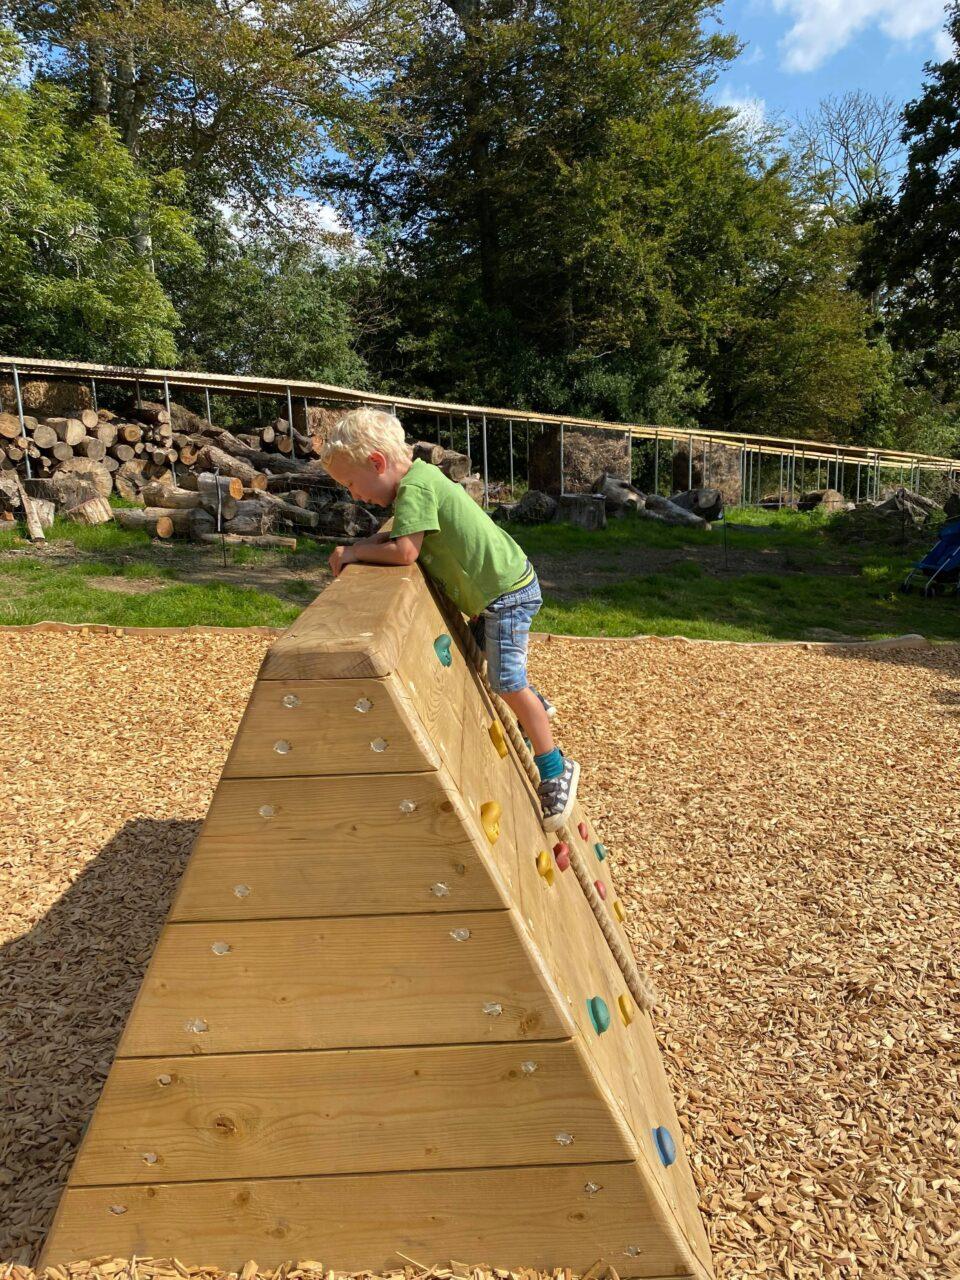 william climbing over a wooden climbing wall